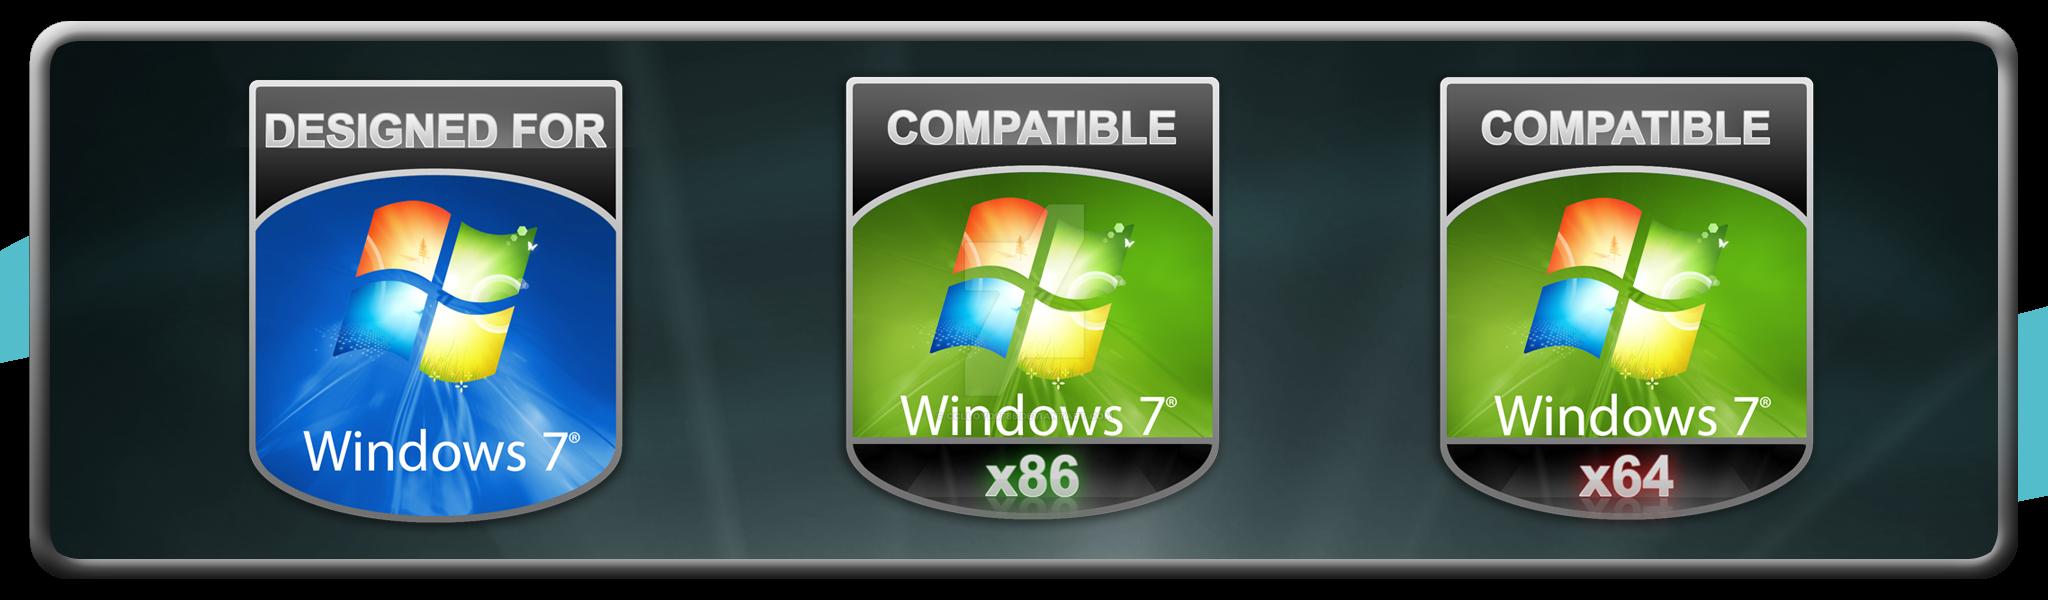 Windows 7 Icons by cclloyd9785